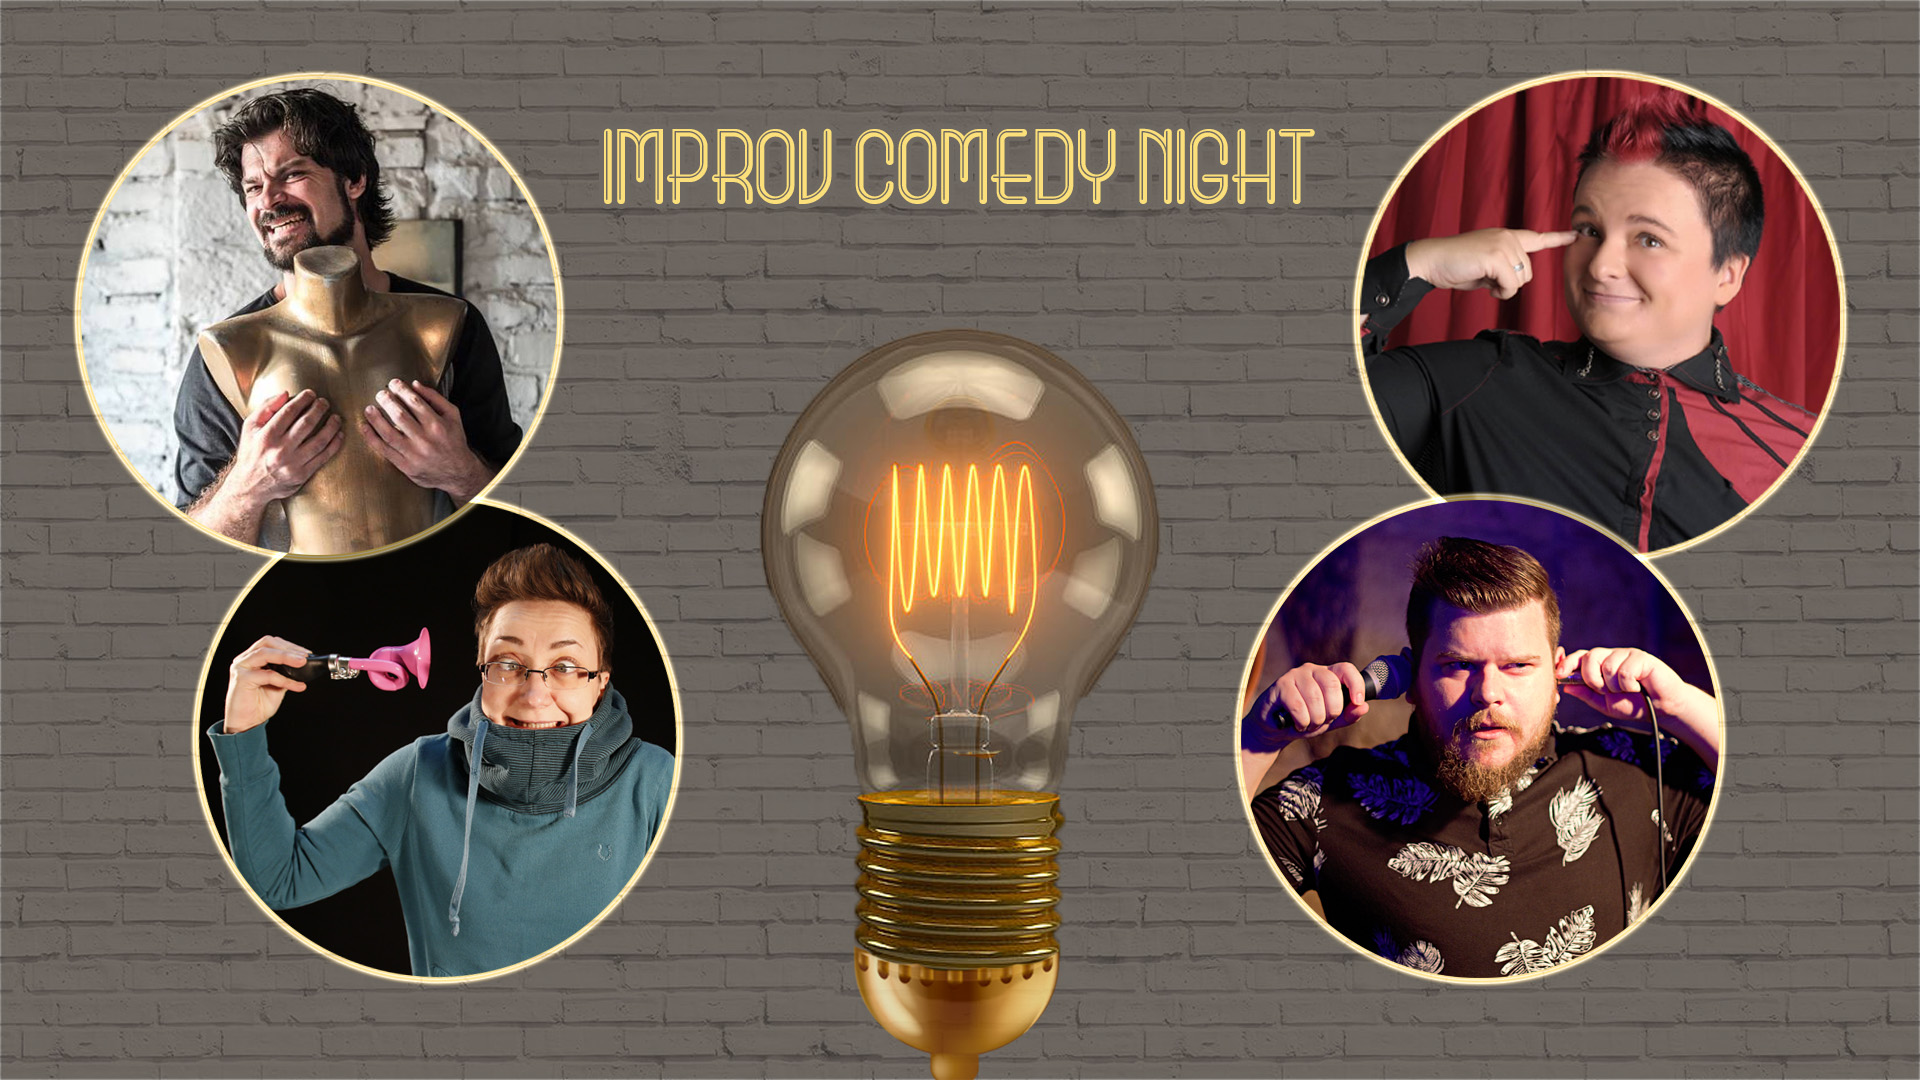 Improv Comedy Night (Hr-Srb-Slo-BiH) - vecer improvizacija